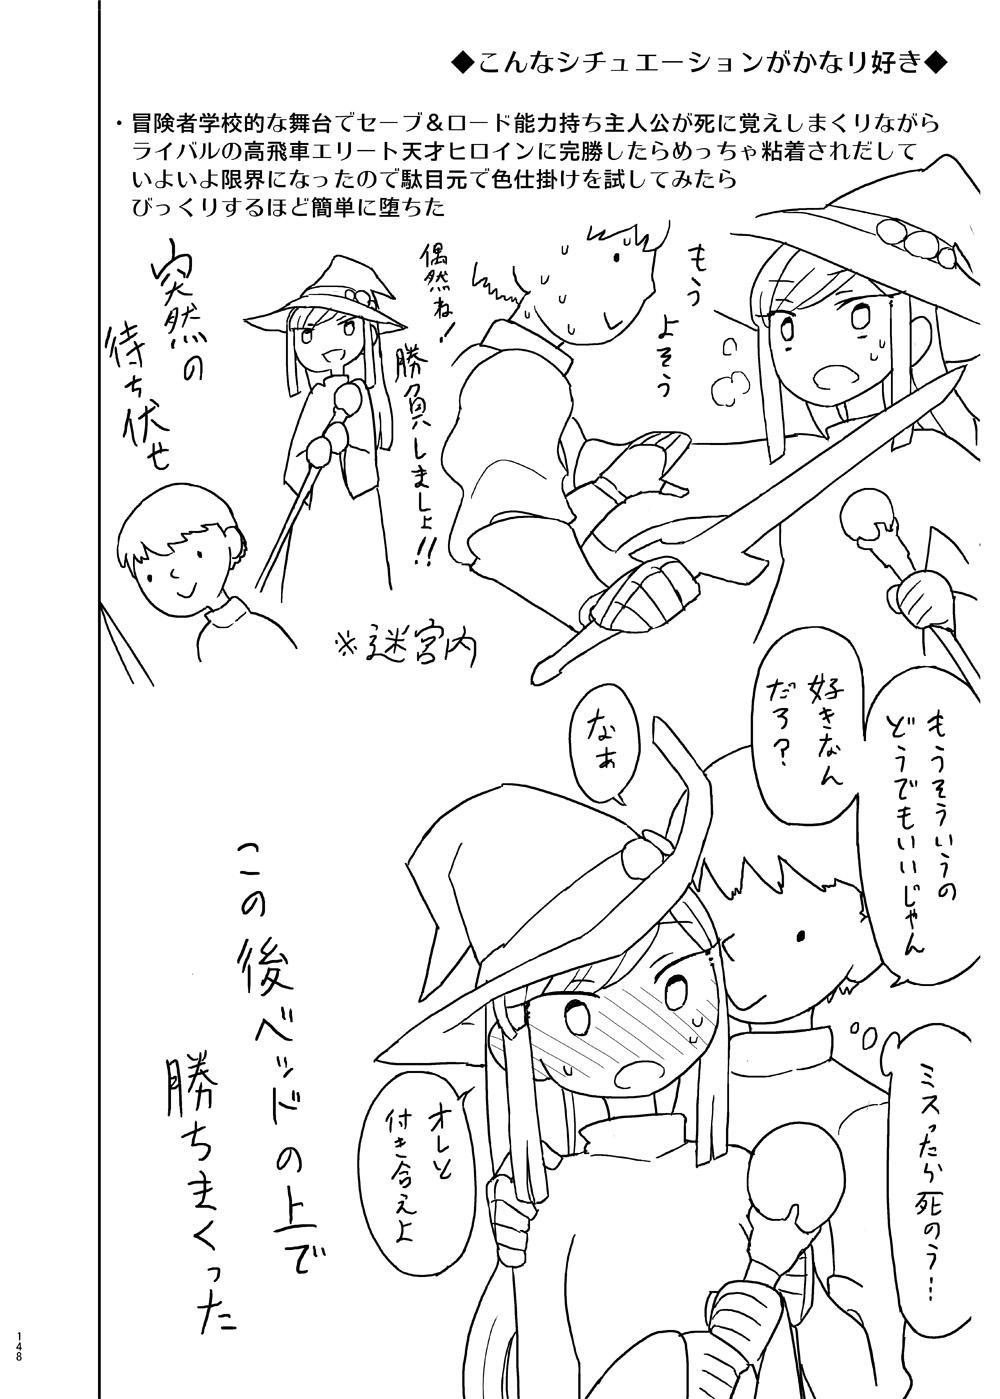 Saimin Katei Kyoushi no Inkou Seijin Muke Soushuuhen 146